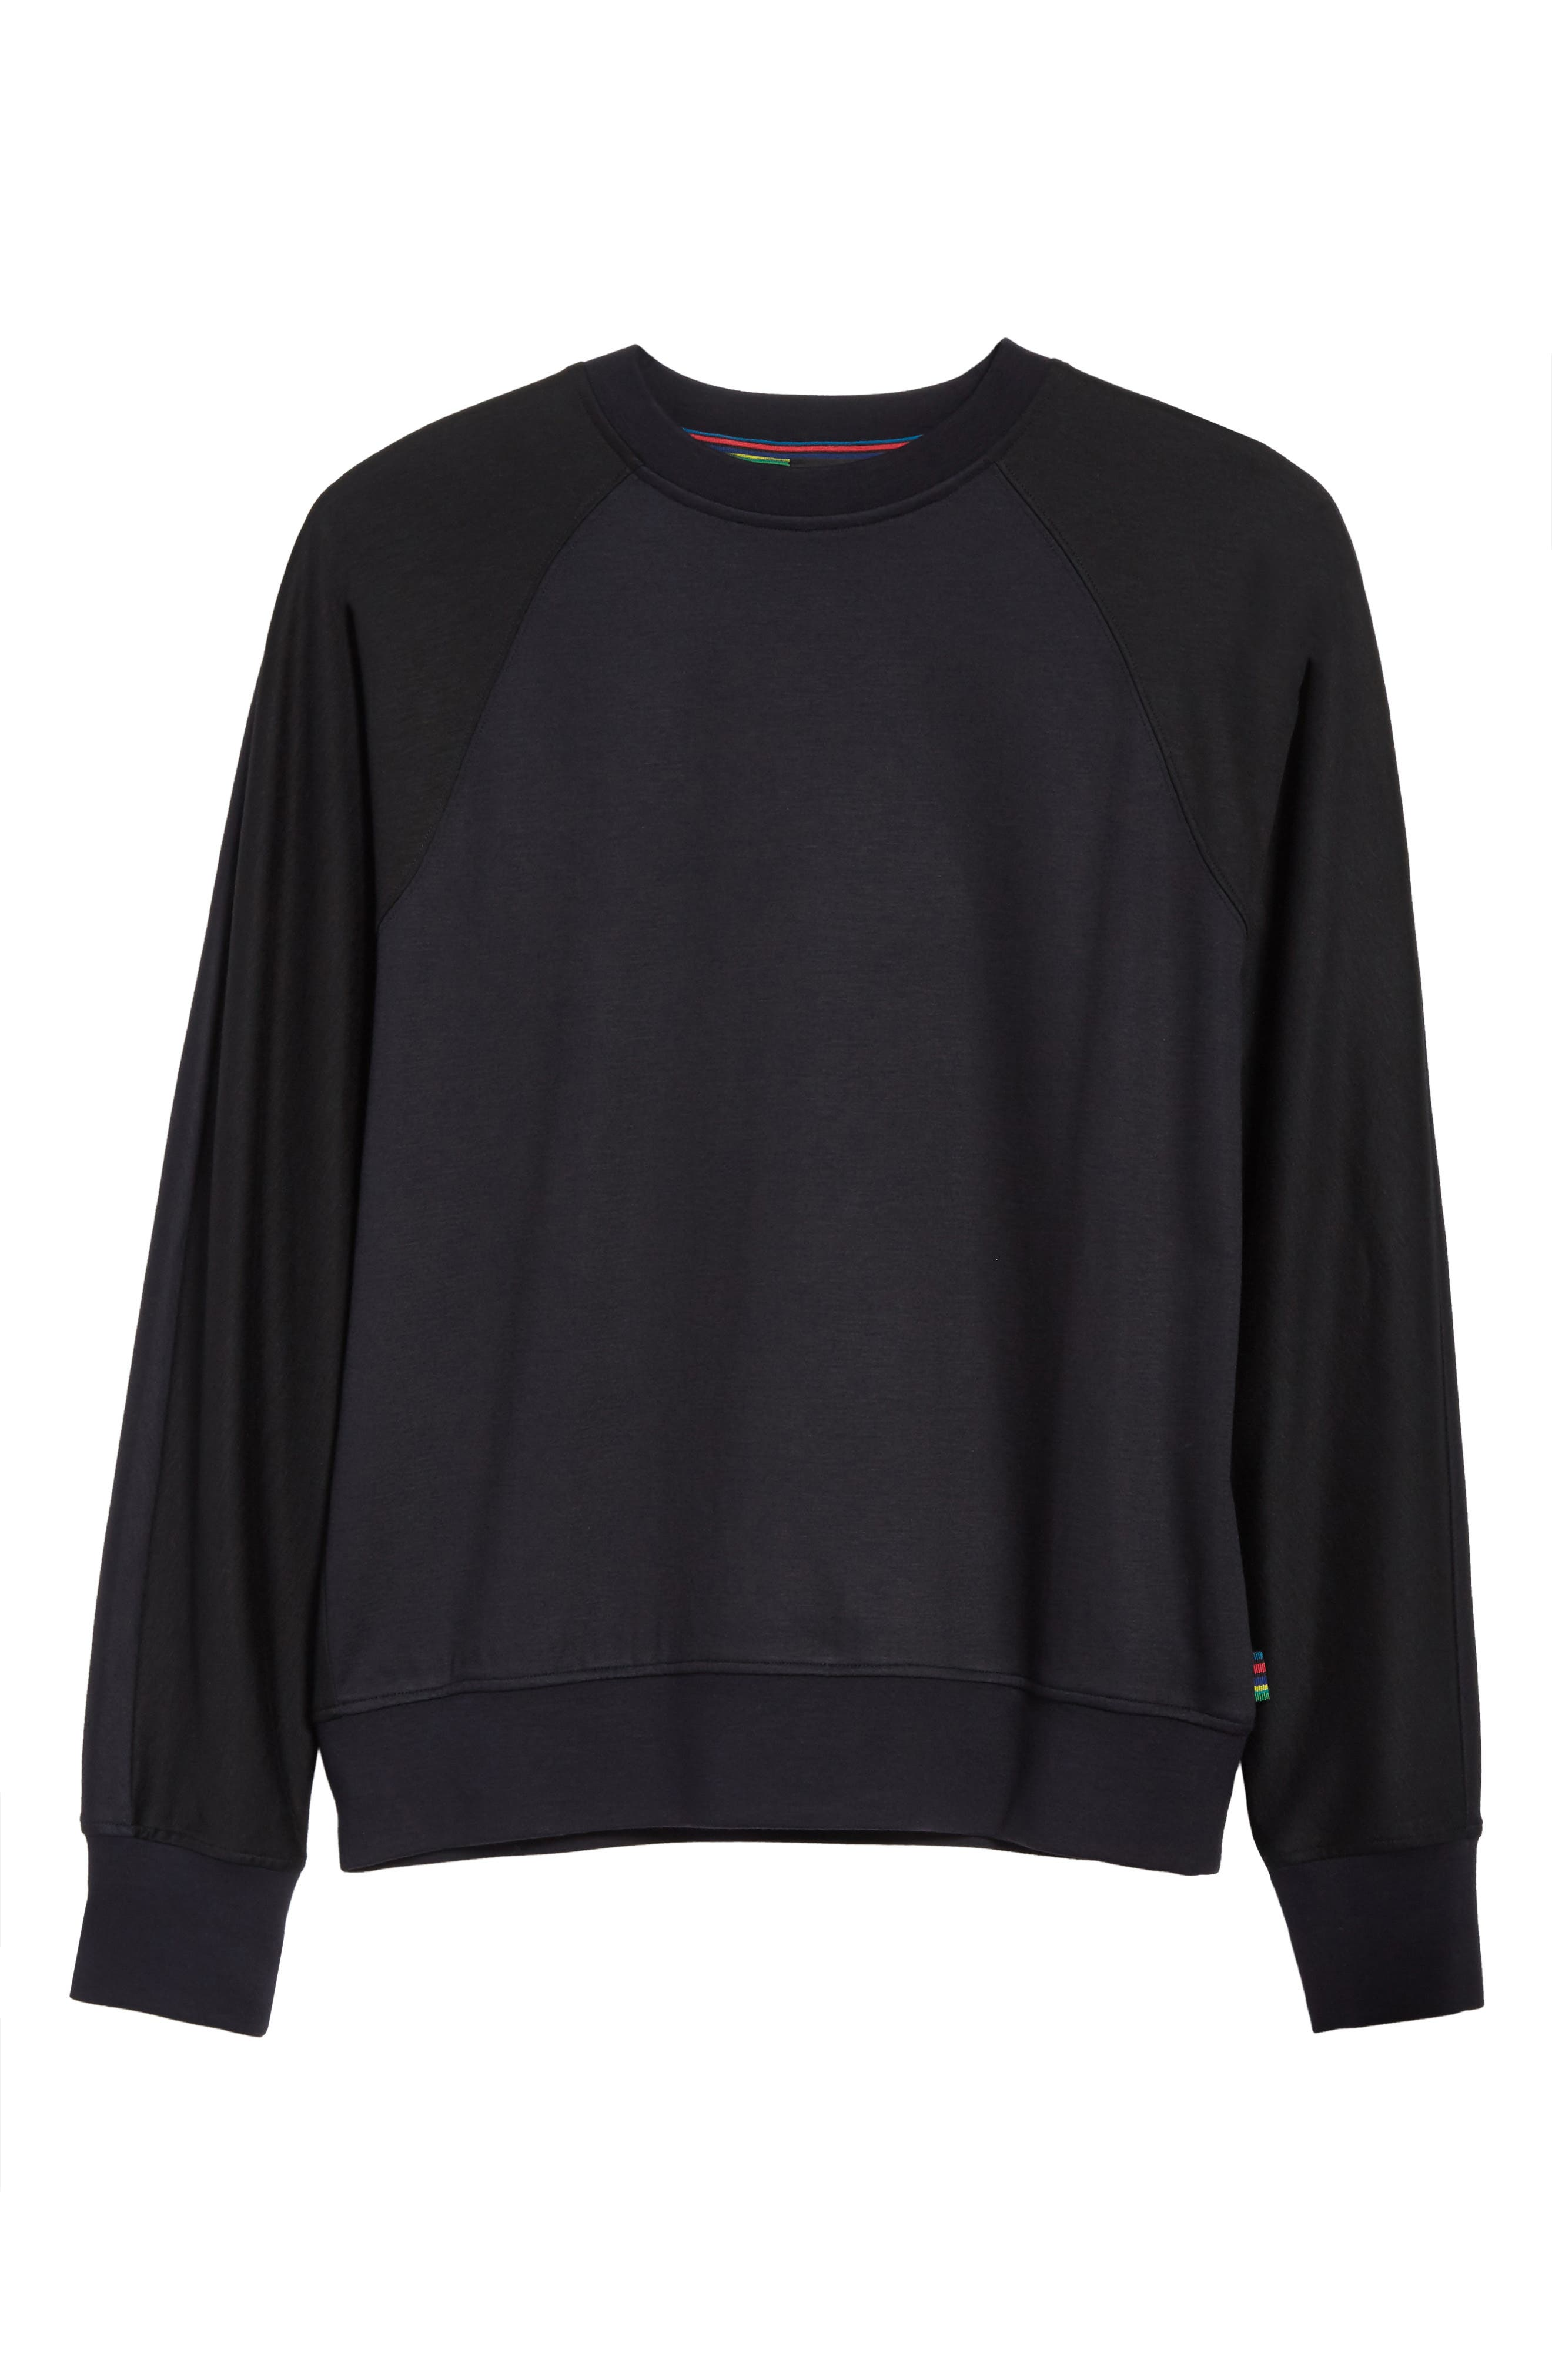 Crewneck Sweatshirt,                             Alternate thumbnail 6, color,                             001